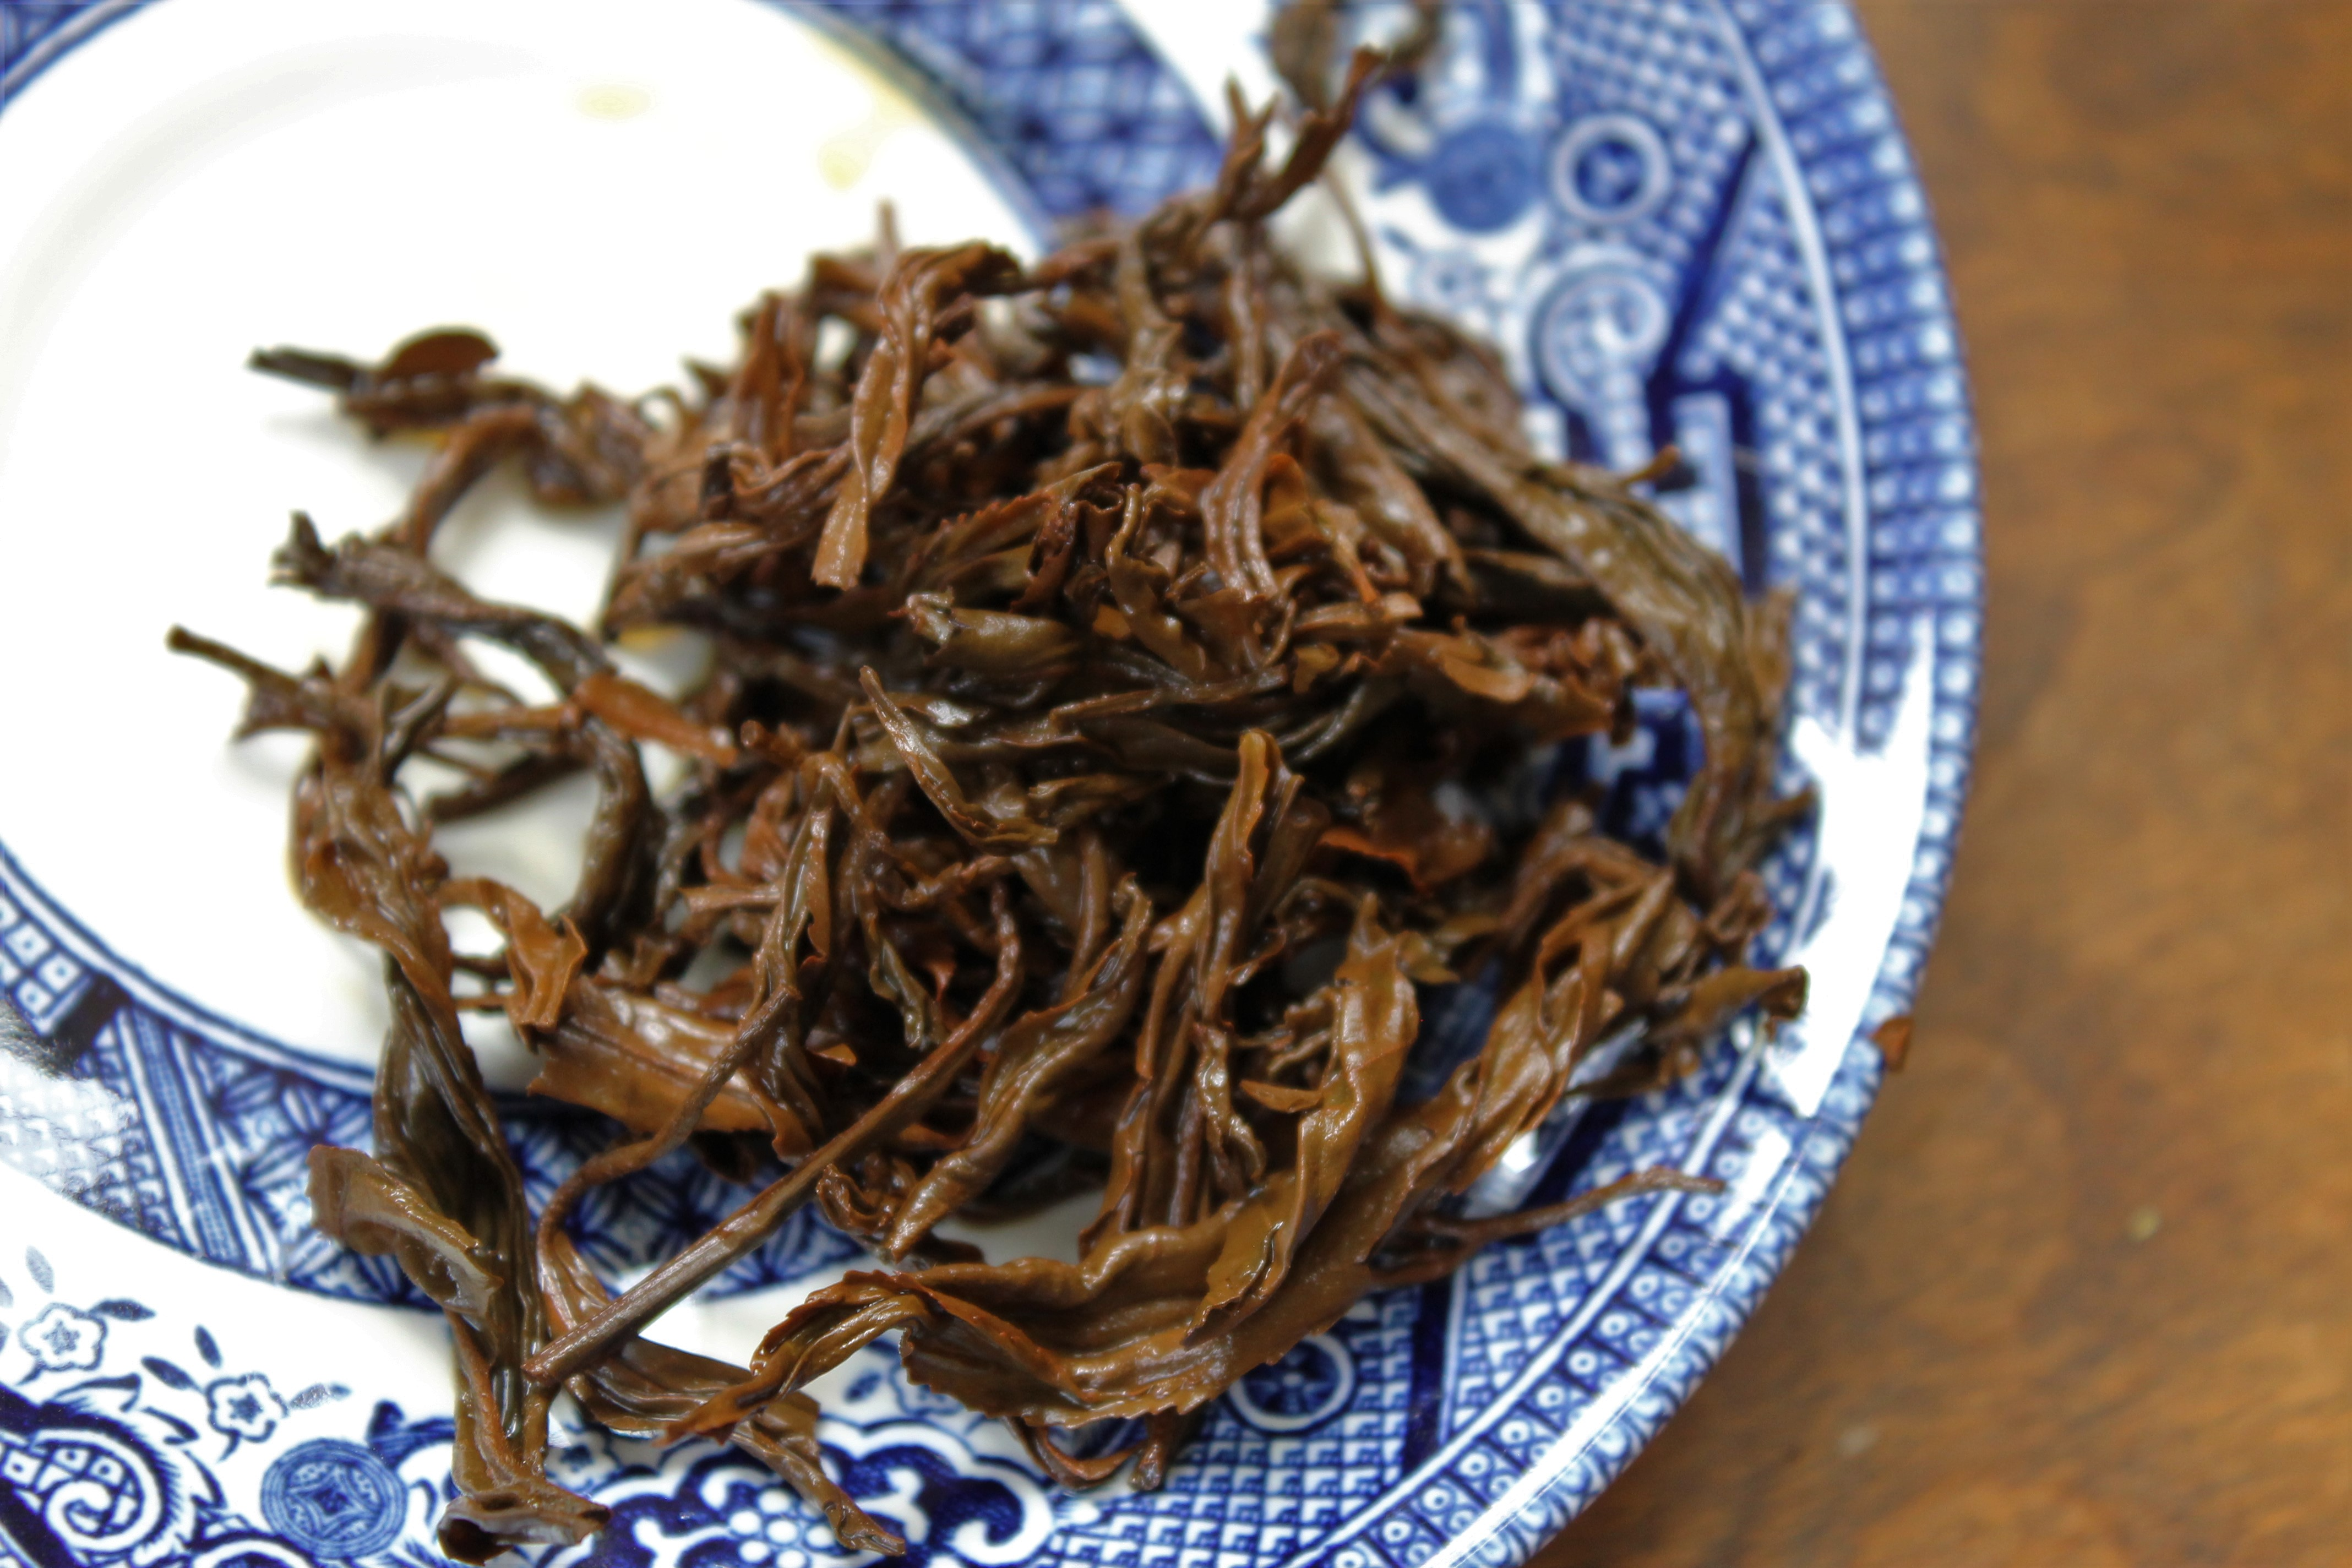 yunnan china black tea on saucer